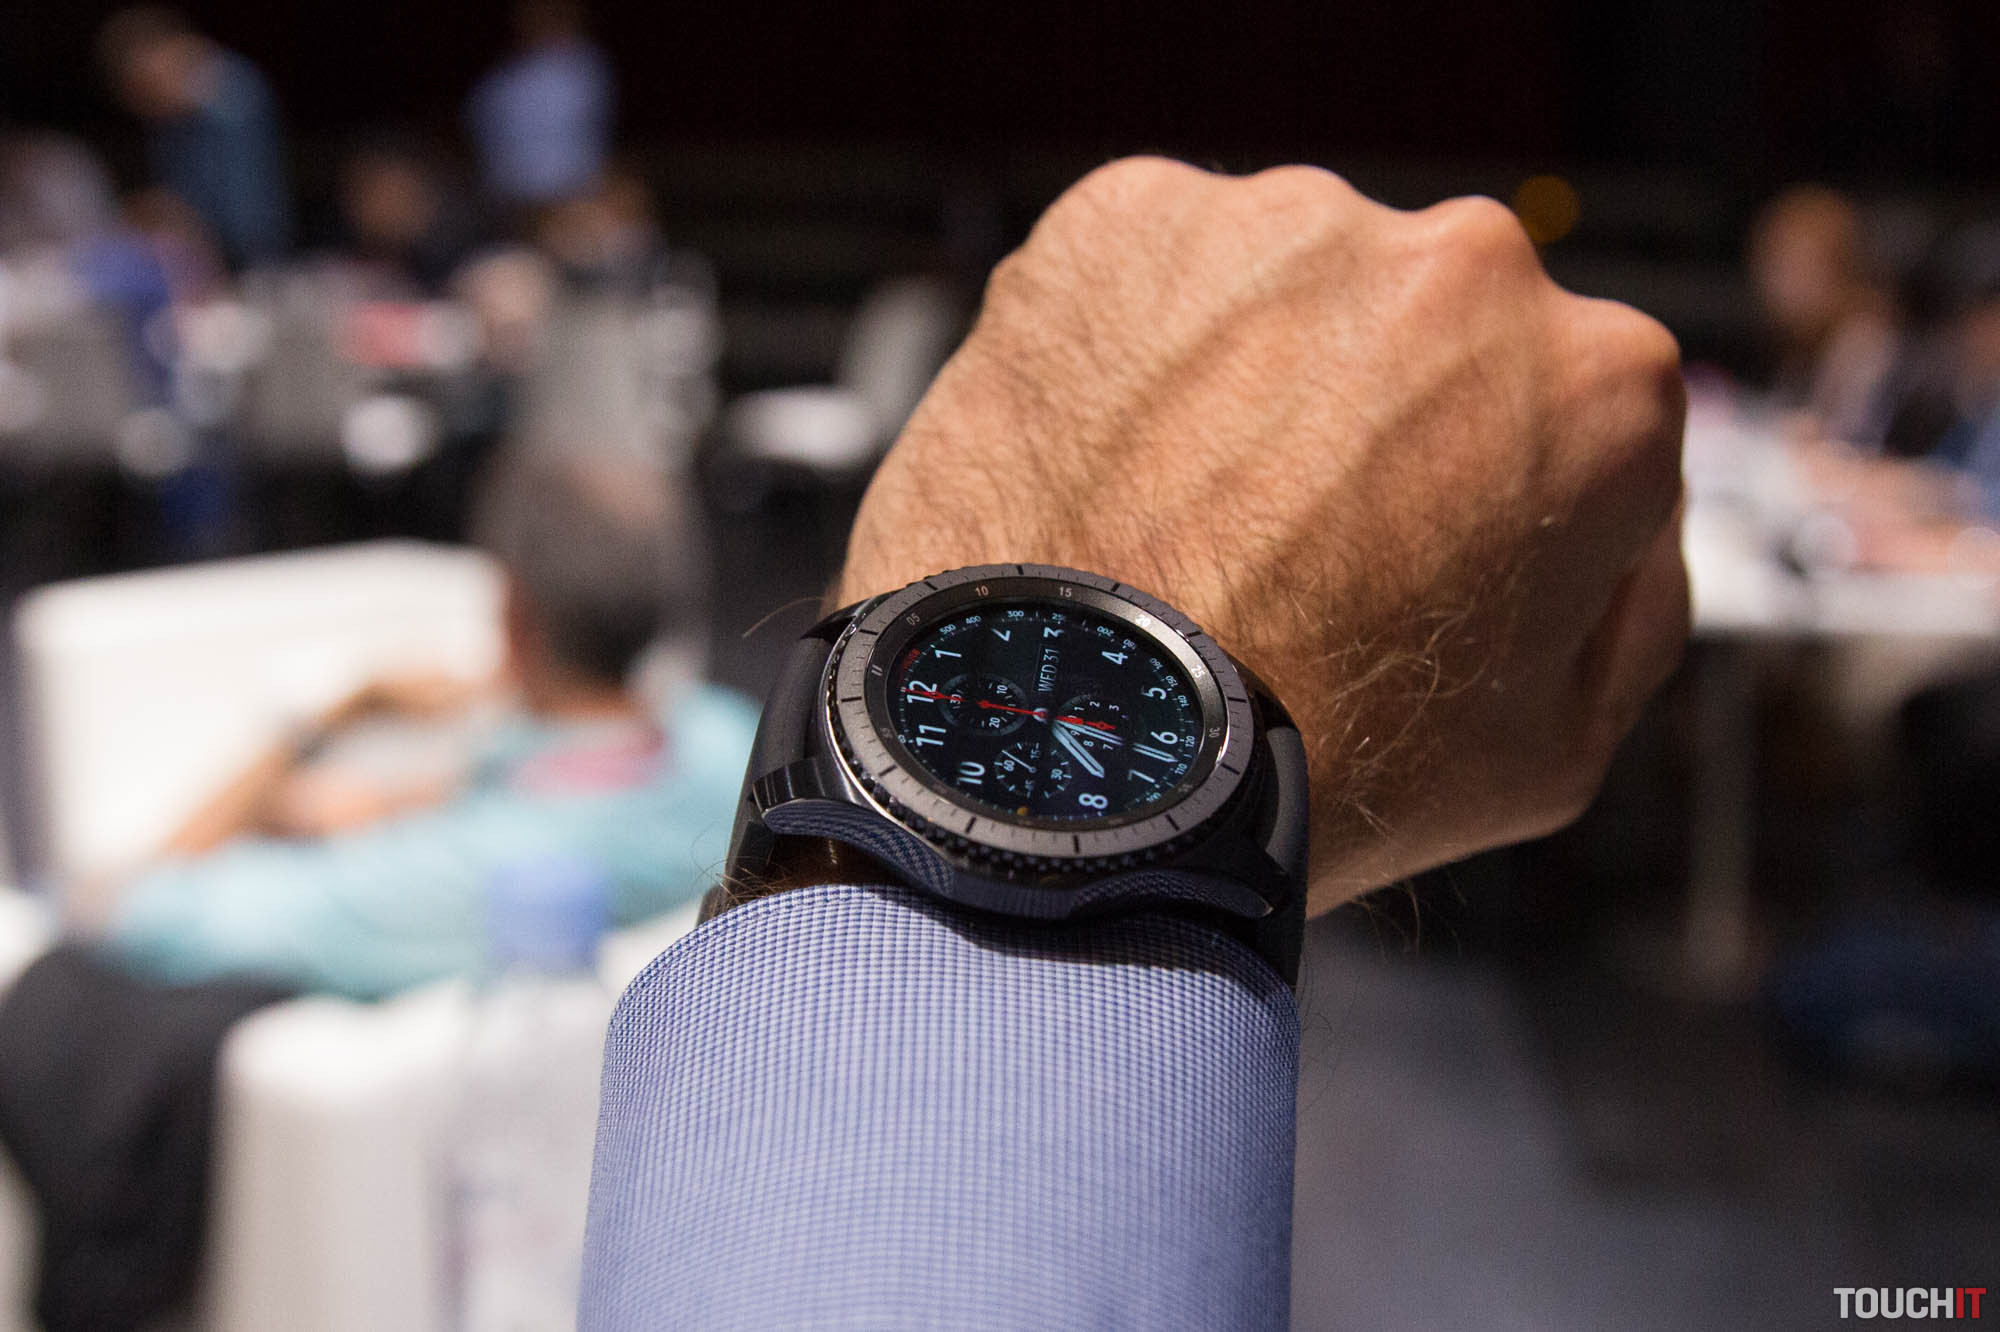 VIDEO TOUCHIT  Inteligentné hodinky Samsung Gear S3 na výstave IFA 2016 09291bb915